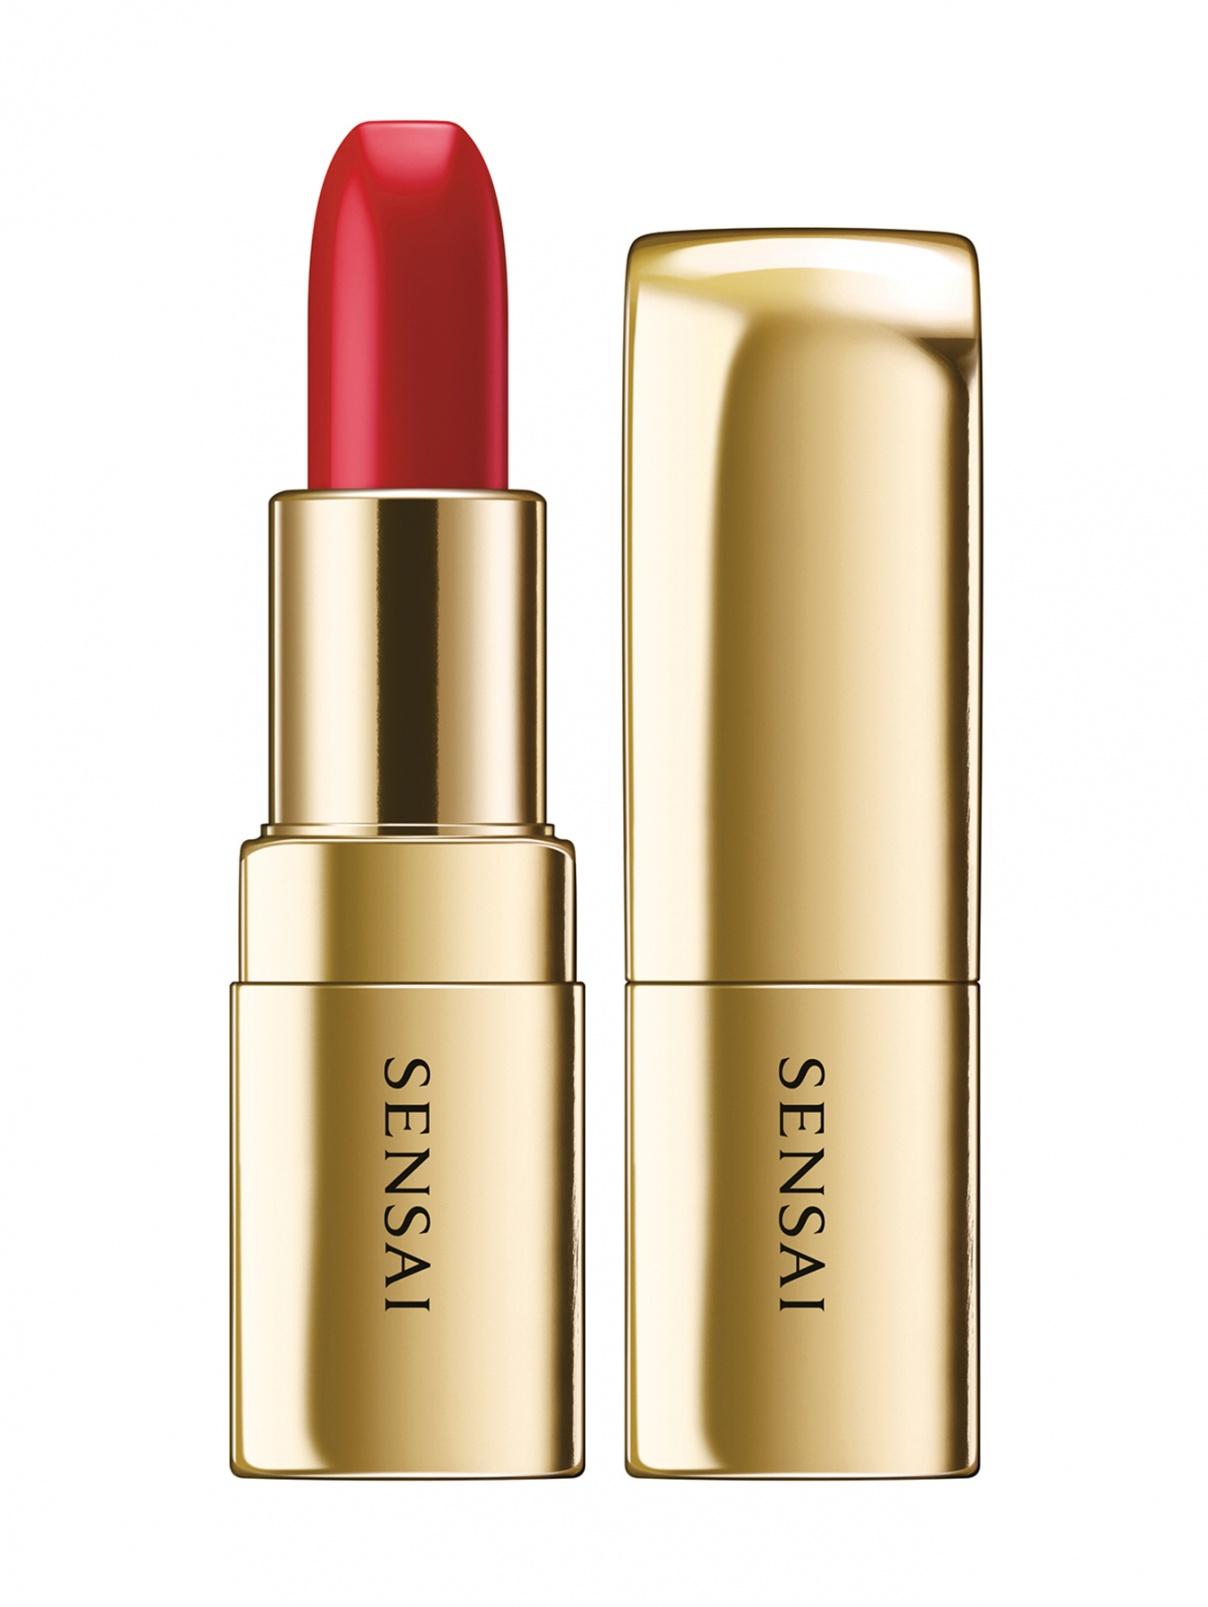 Помада The Lipstick оттенок - 02 SAZANKA RED Makeup Sensai  –  Общий вид